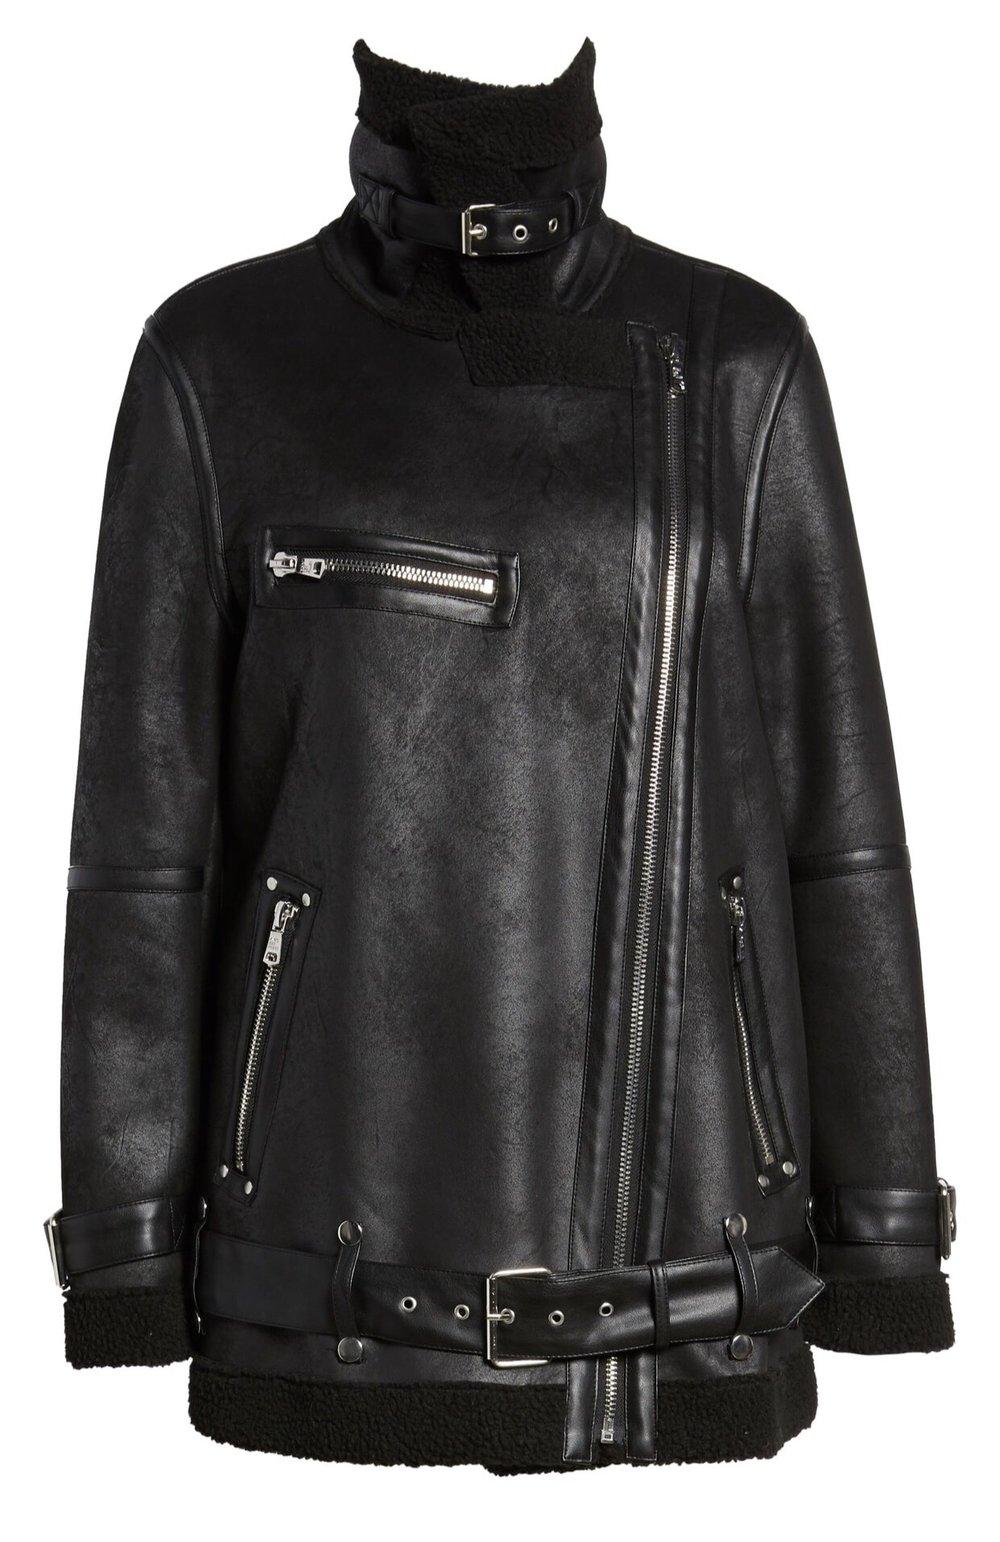 Avec Les Filles Shearling Jacket {$129.90} - After sale: $199